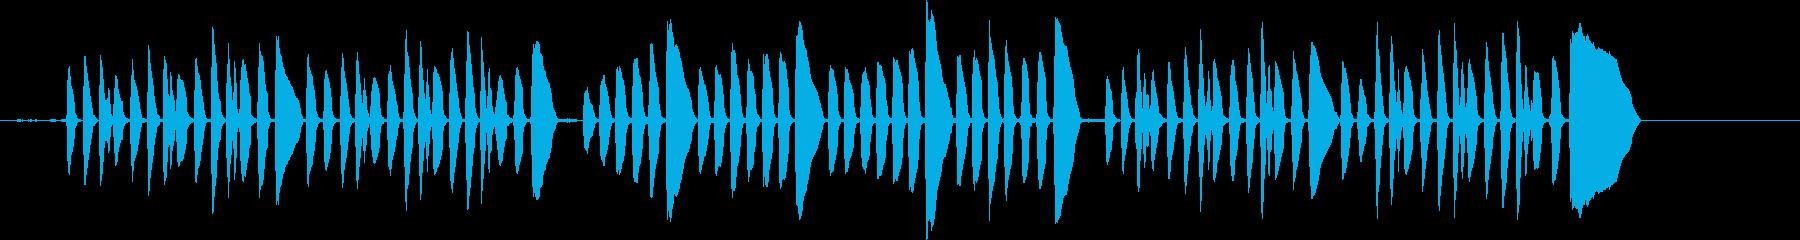 Bugle PlaysΓÇÿrev...の再生済みの波形